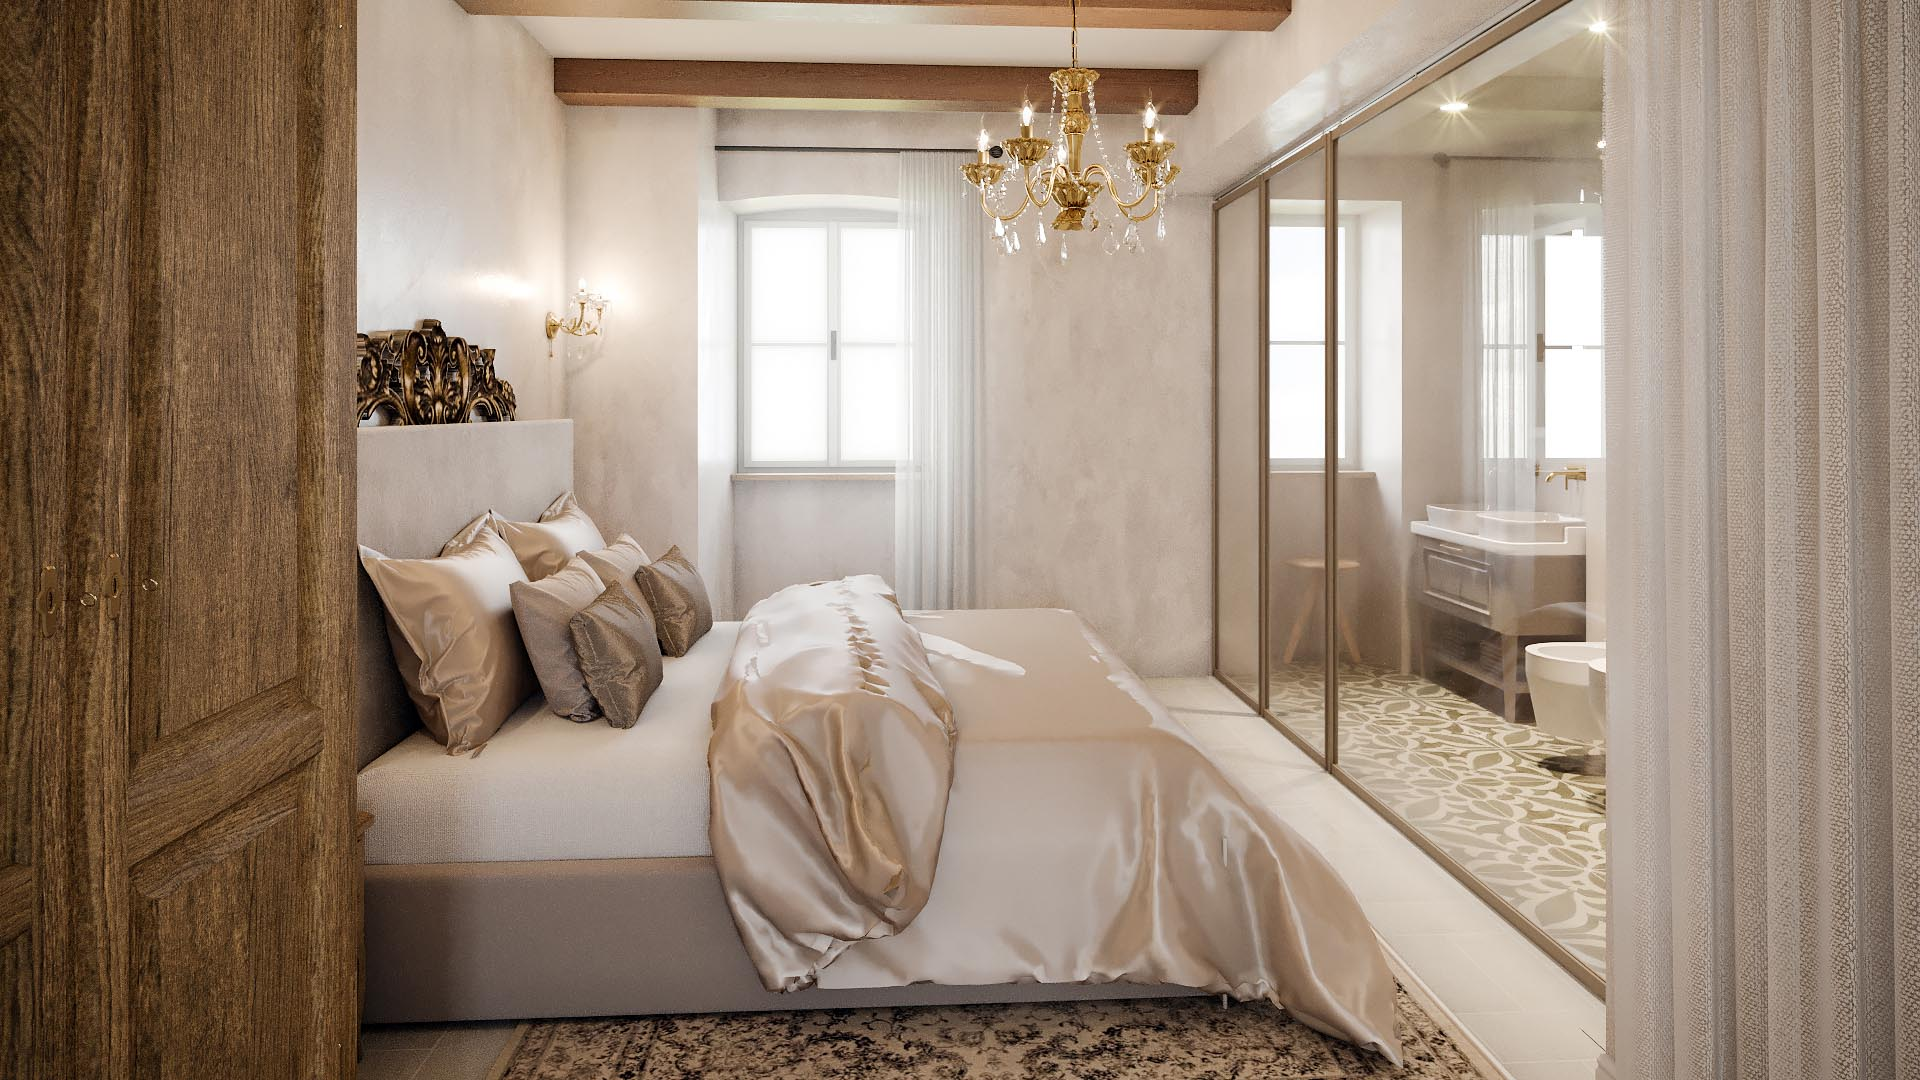 POKE_studio_services_hospitality_hotel_apartment2.jpg